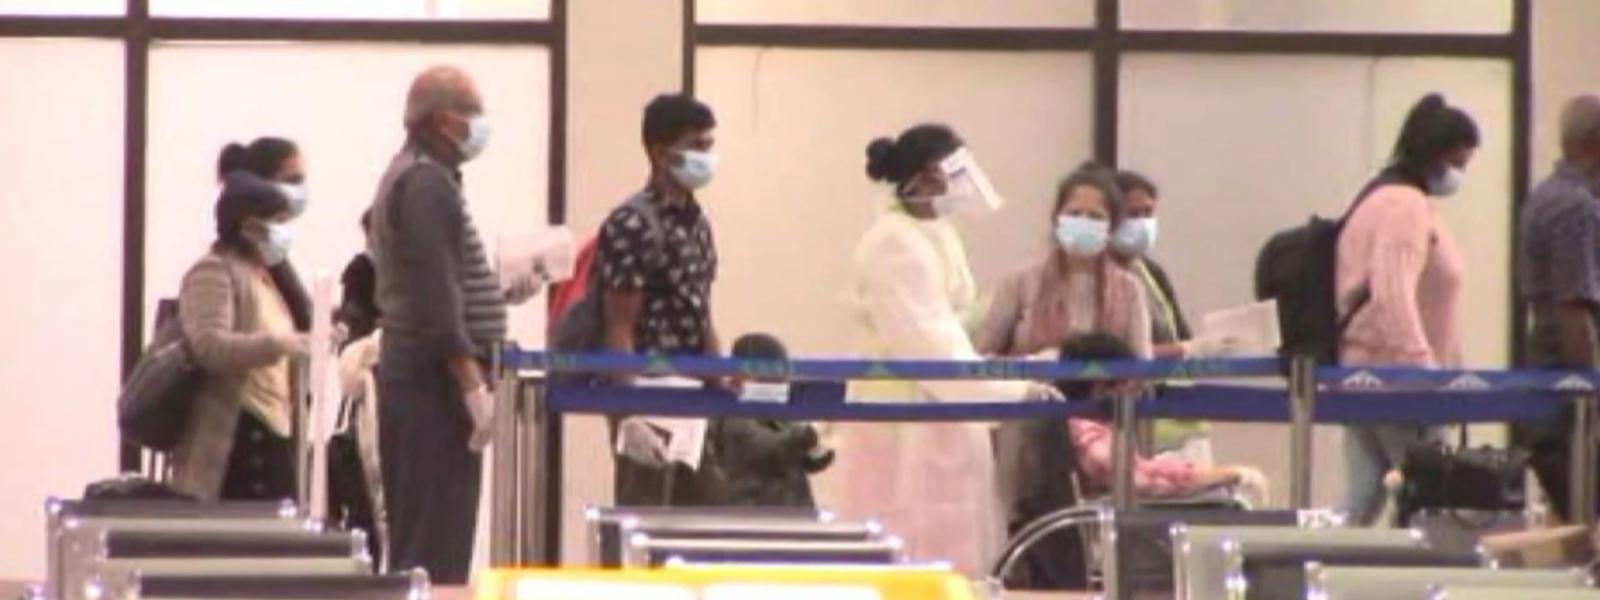 Over 700 Sri Lankans repatriated from overseas, arrive in SL